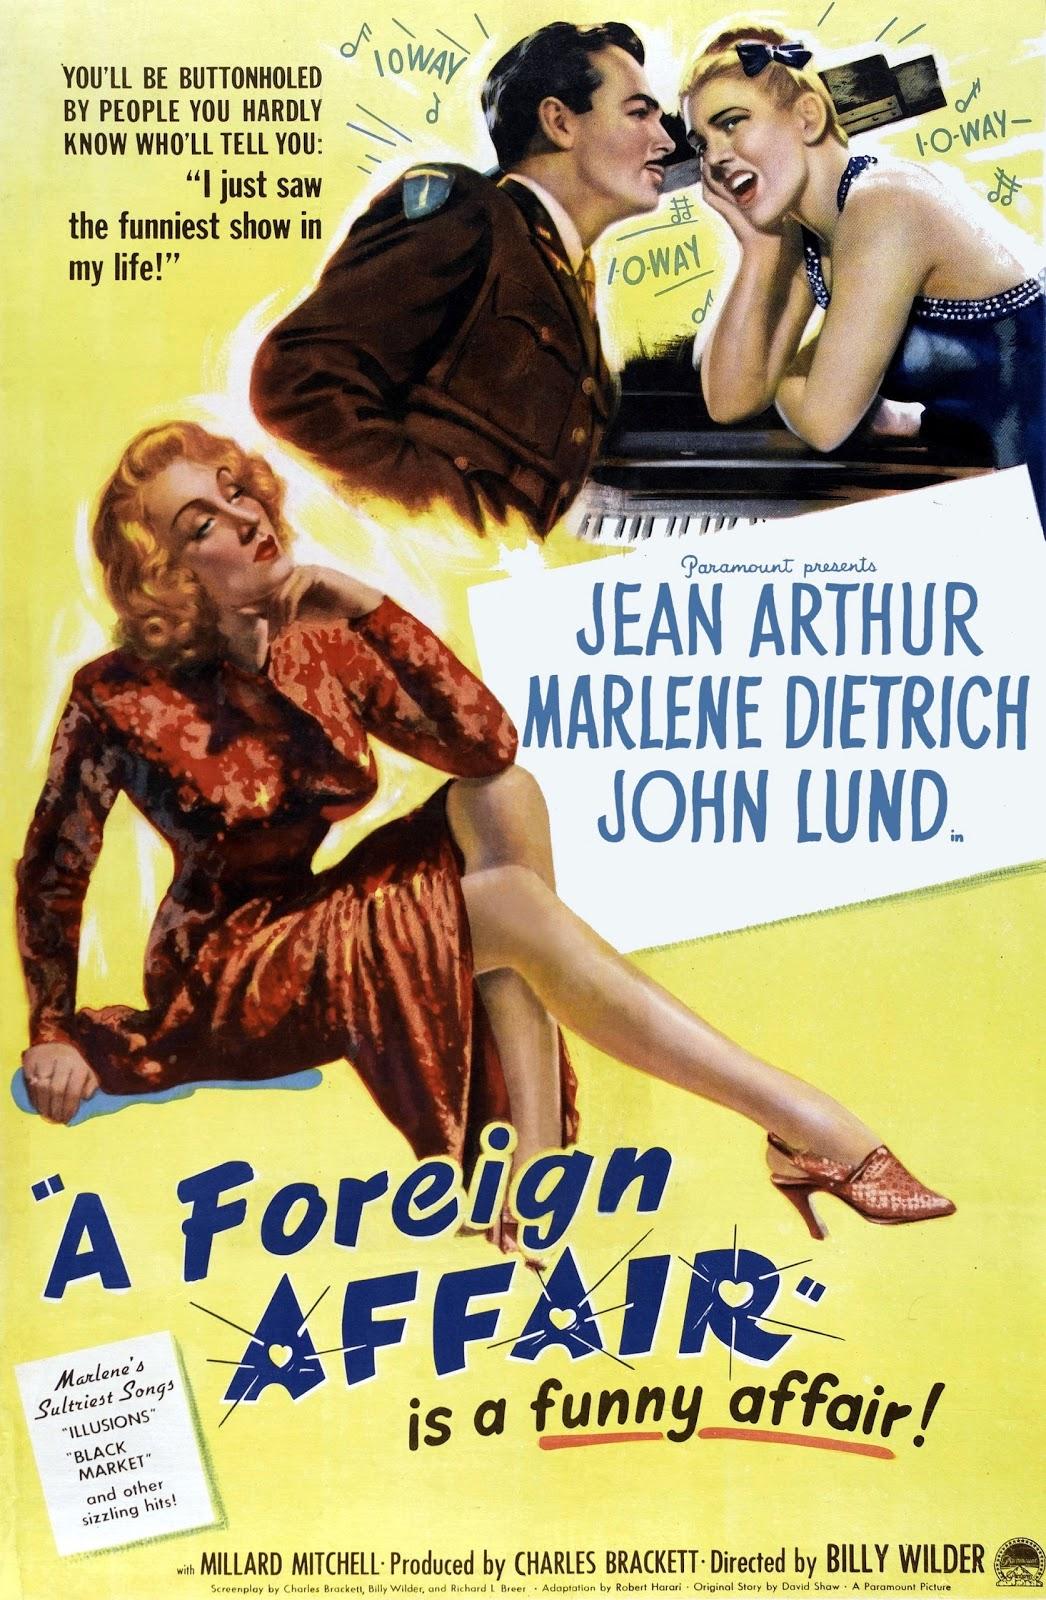 http://3.bp.blogspot.com/-6JIhrI9xHTQ/UIRefU7NprI/AAAAAAAAEME/FaaIkEXw4Rs/s1600/a+foreign+affair+poster.jpg